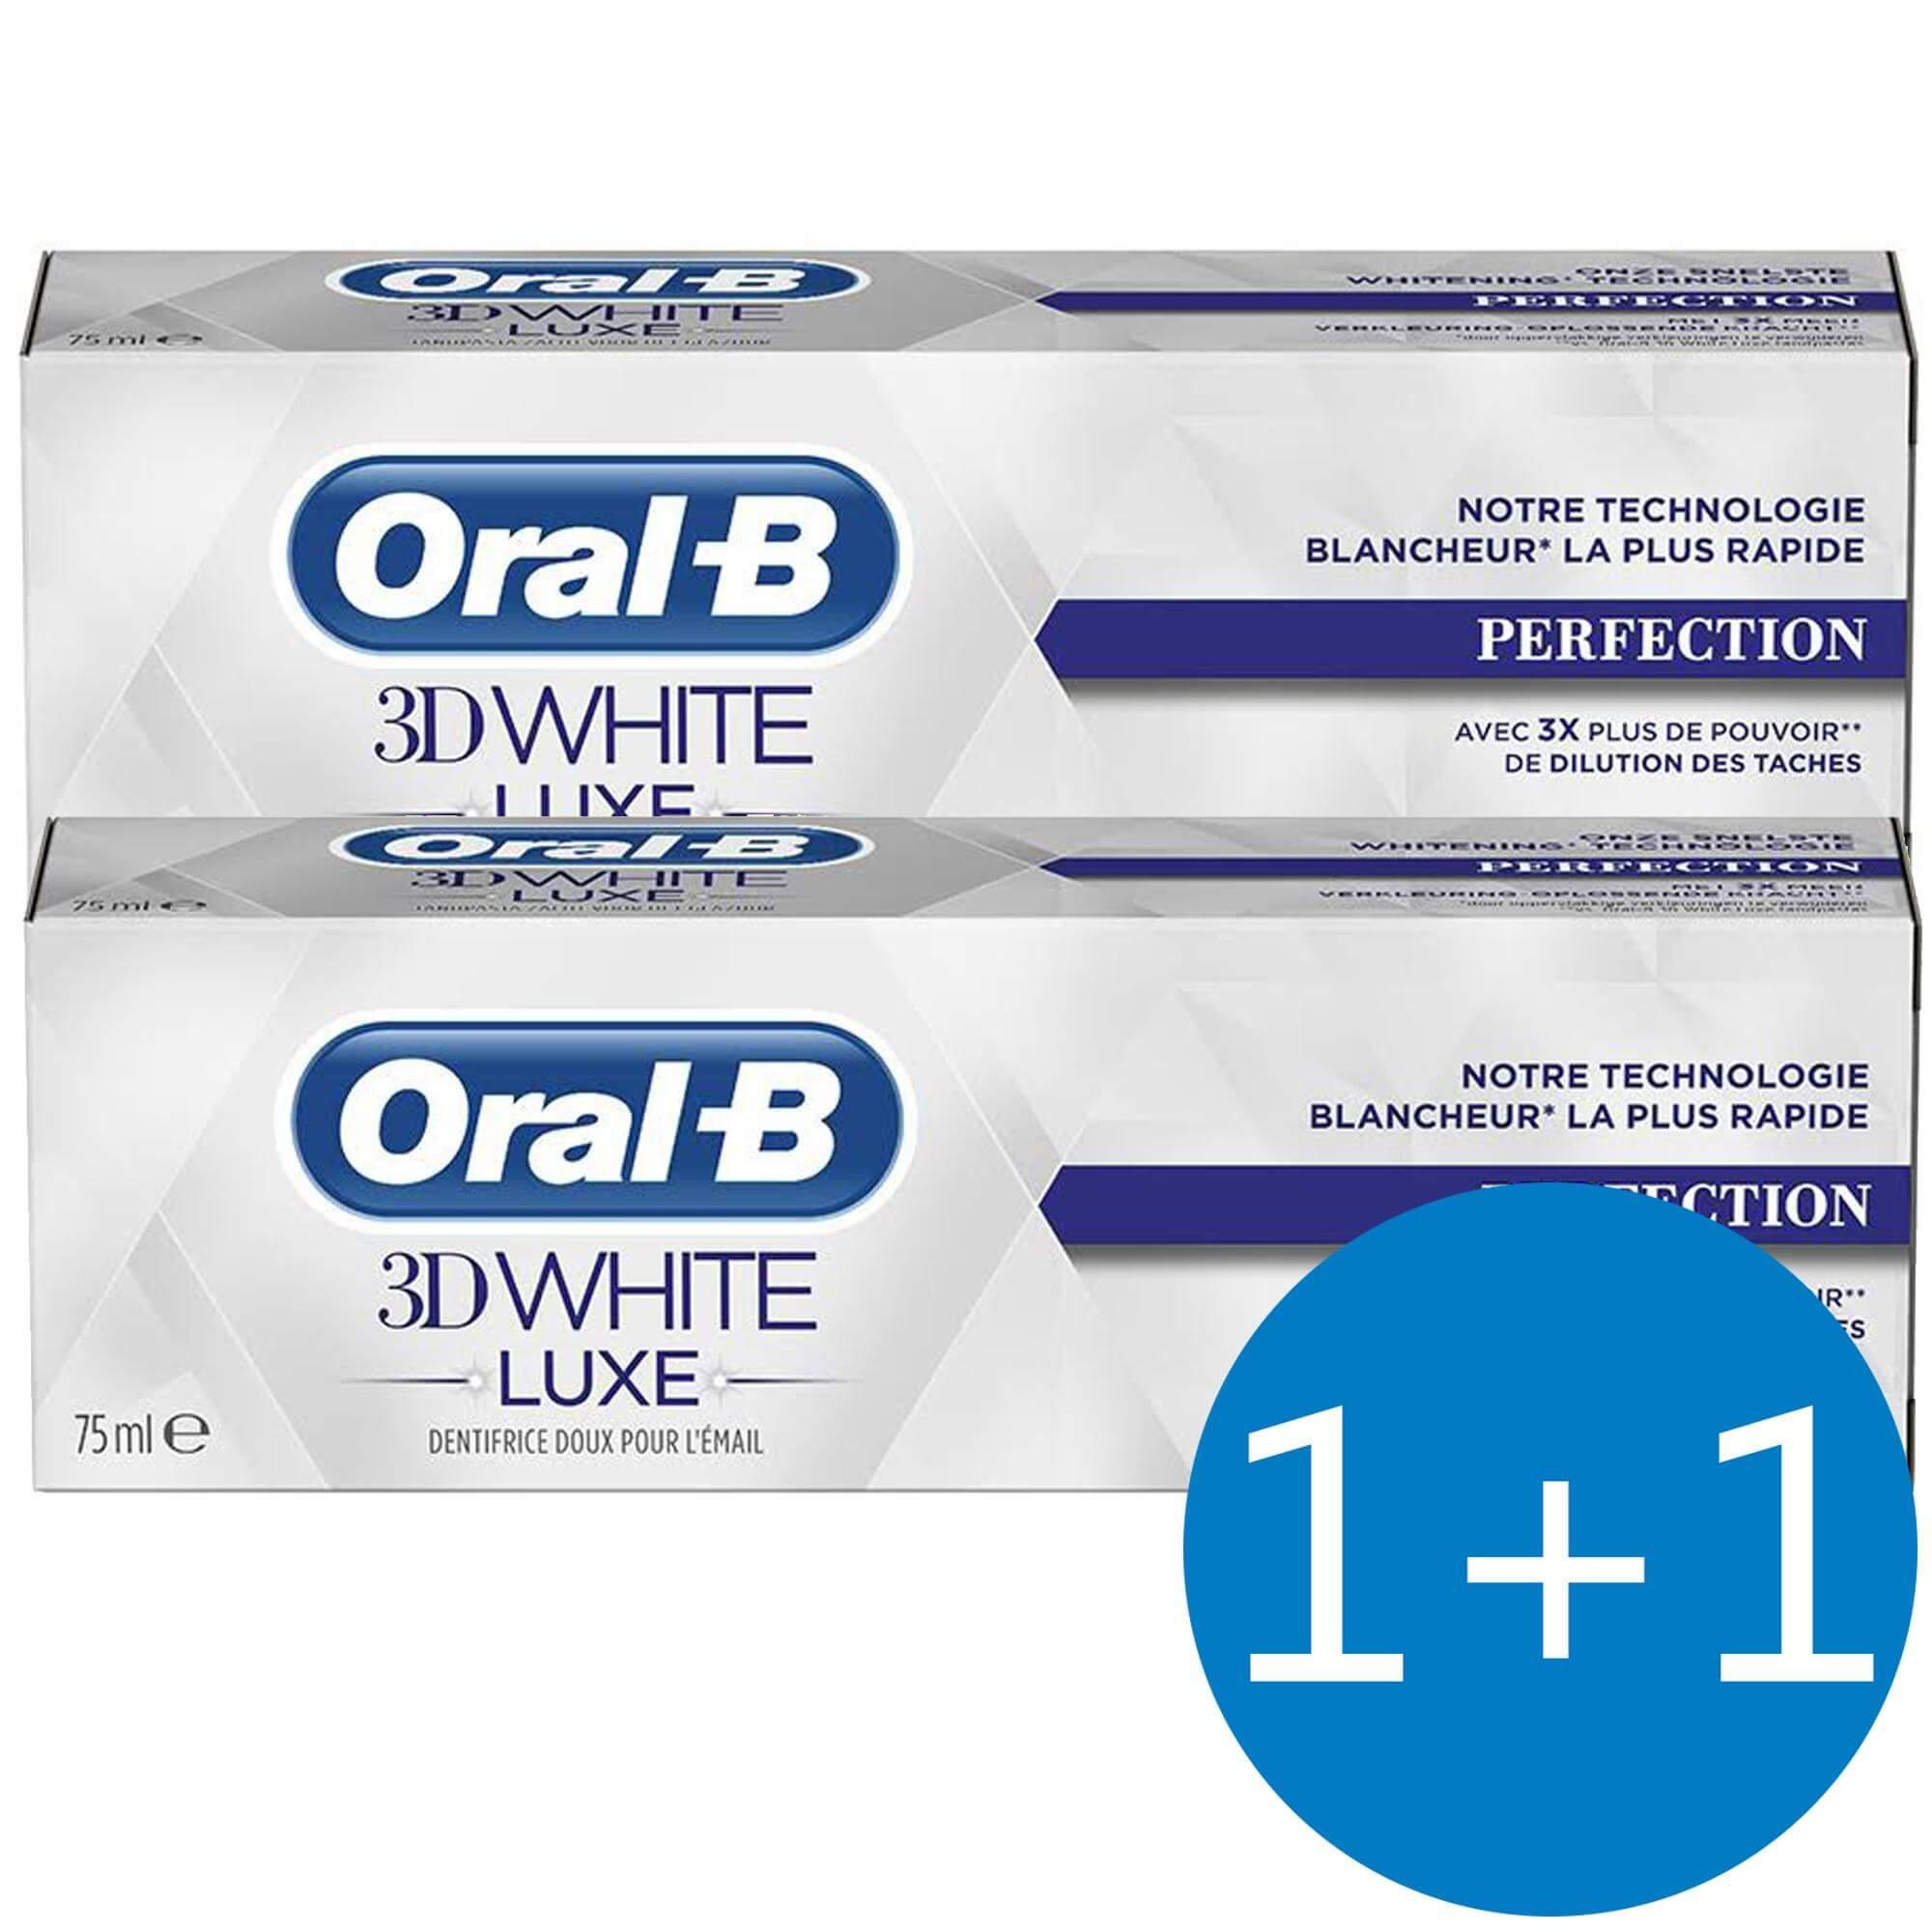 Oral B Πακέτο Προσφοράς 3D White Luxe Perfection Οδοντόκρεμα Απαλή με το Σμάλτο 75ml 1+1 Δώρο